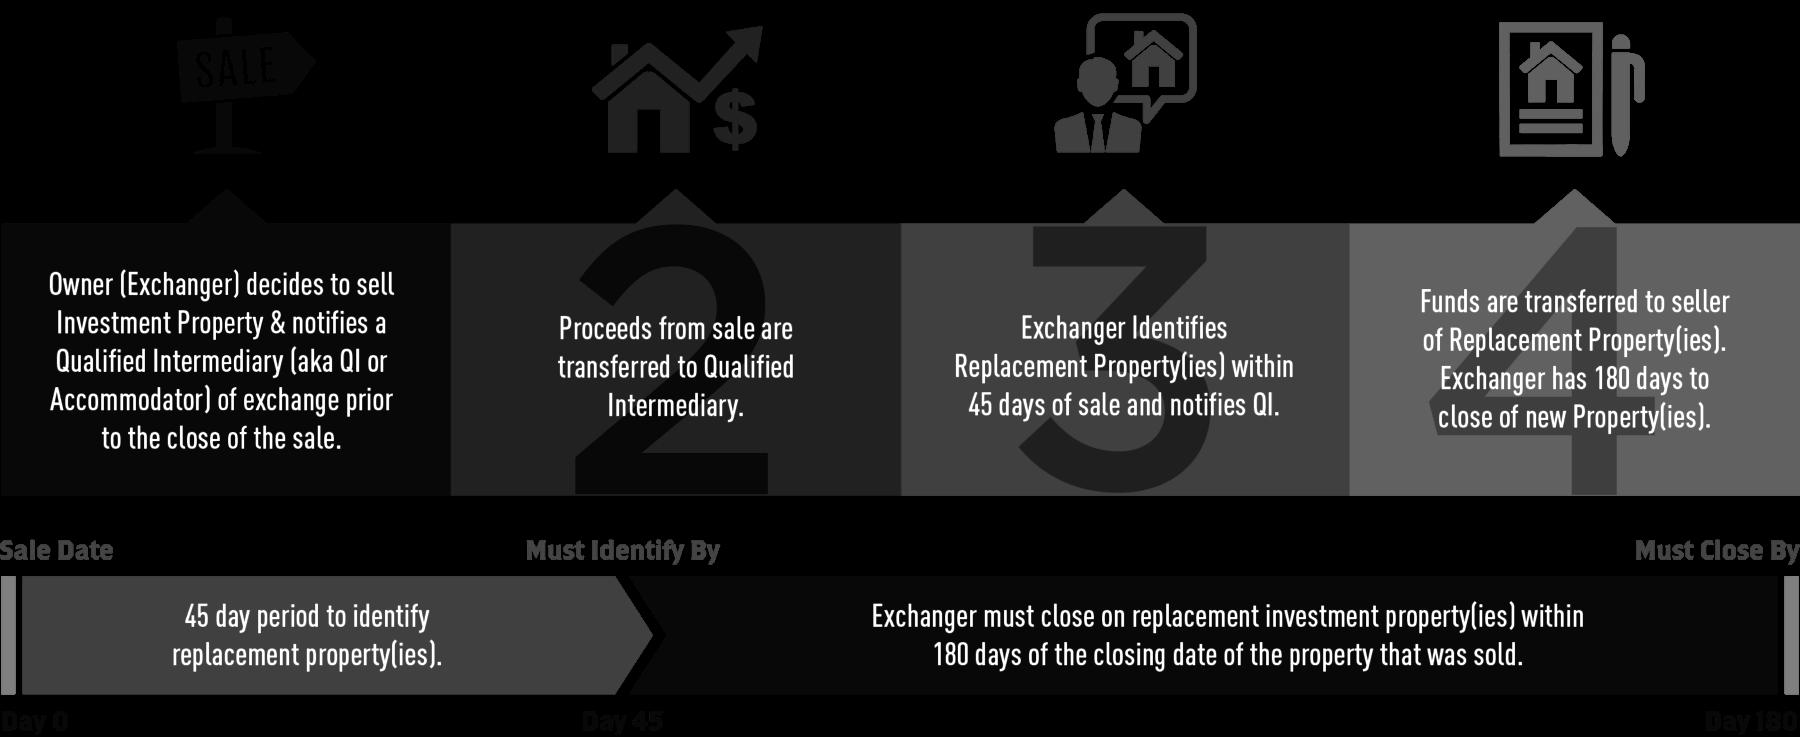 1031 Exchange Rules - الصرف المؤجل الضريبي